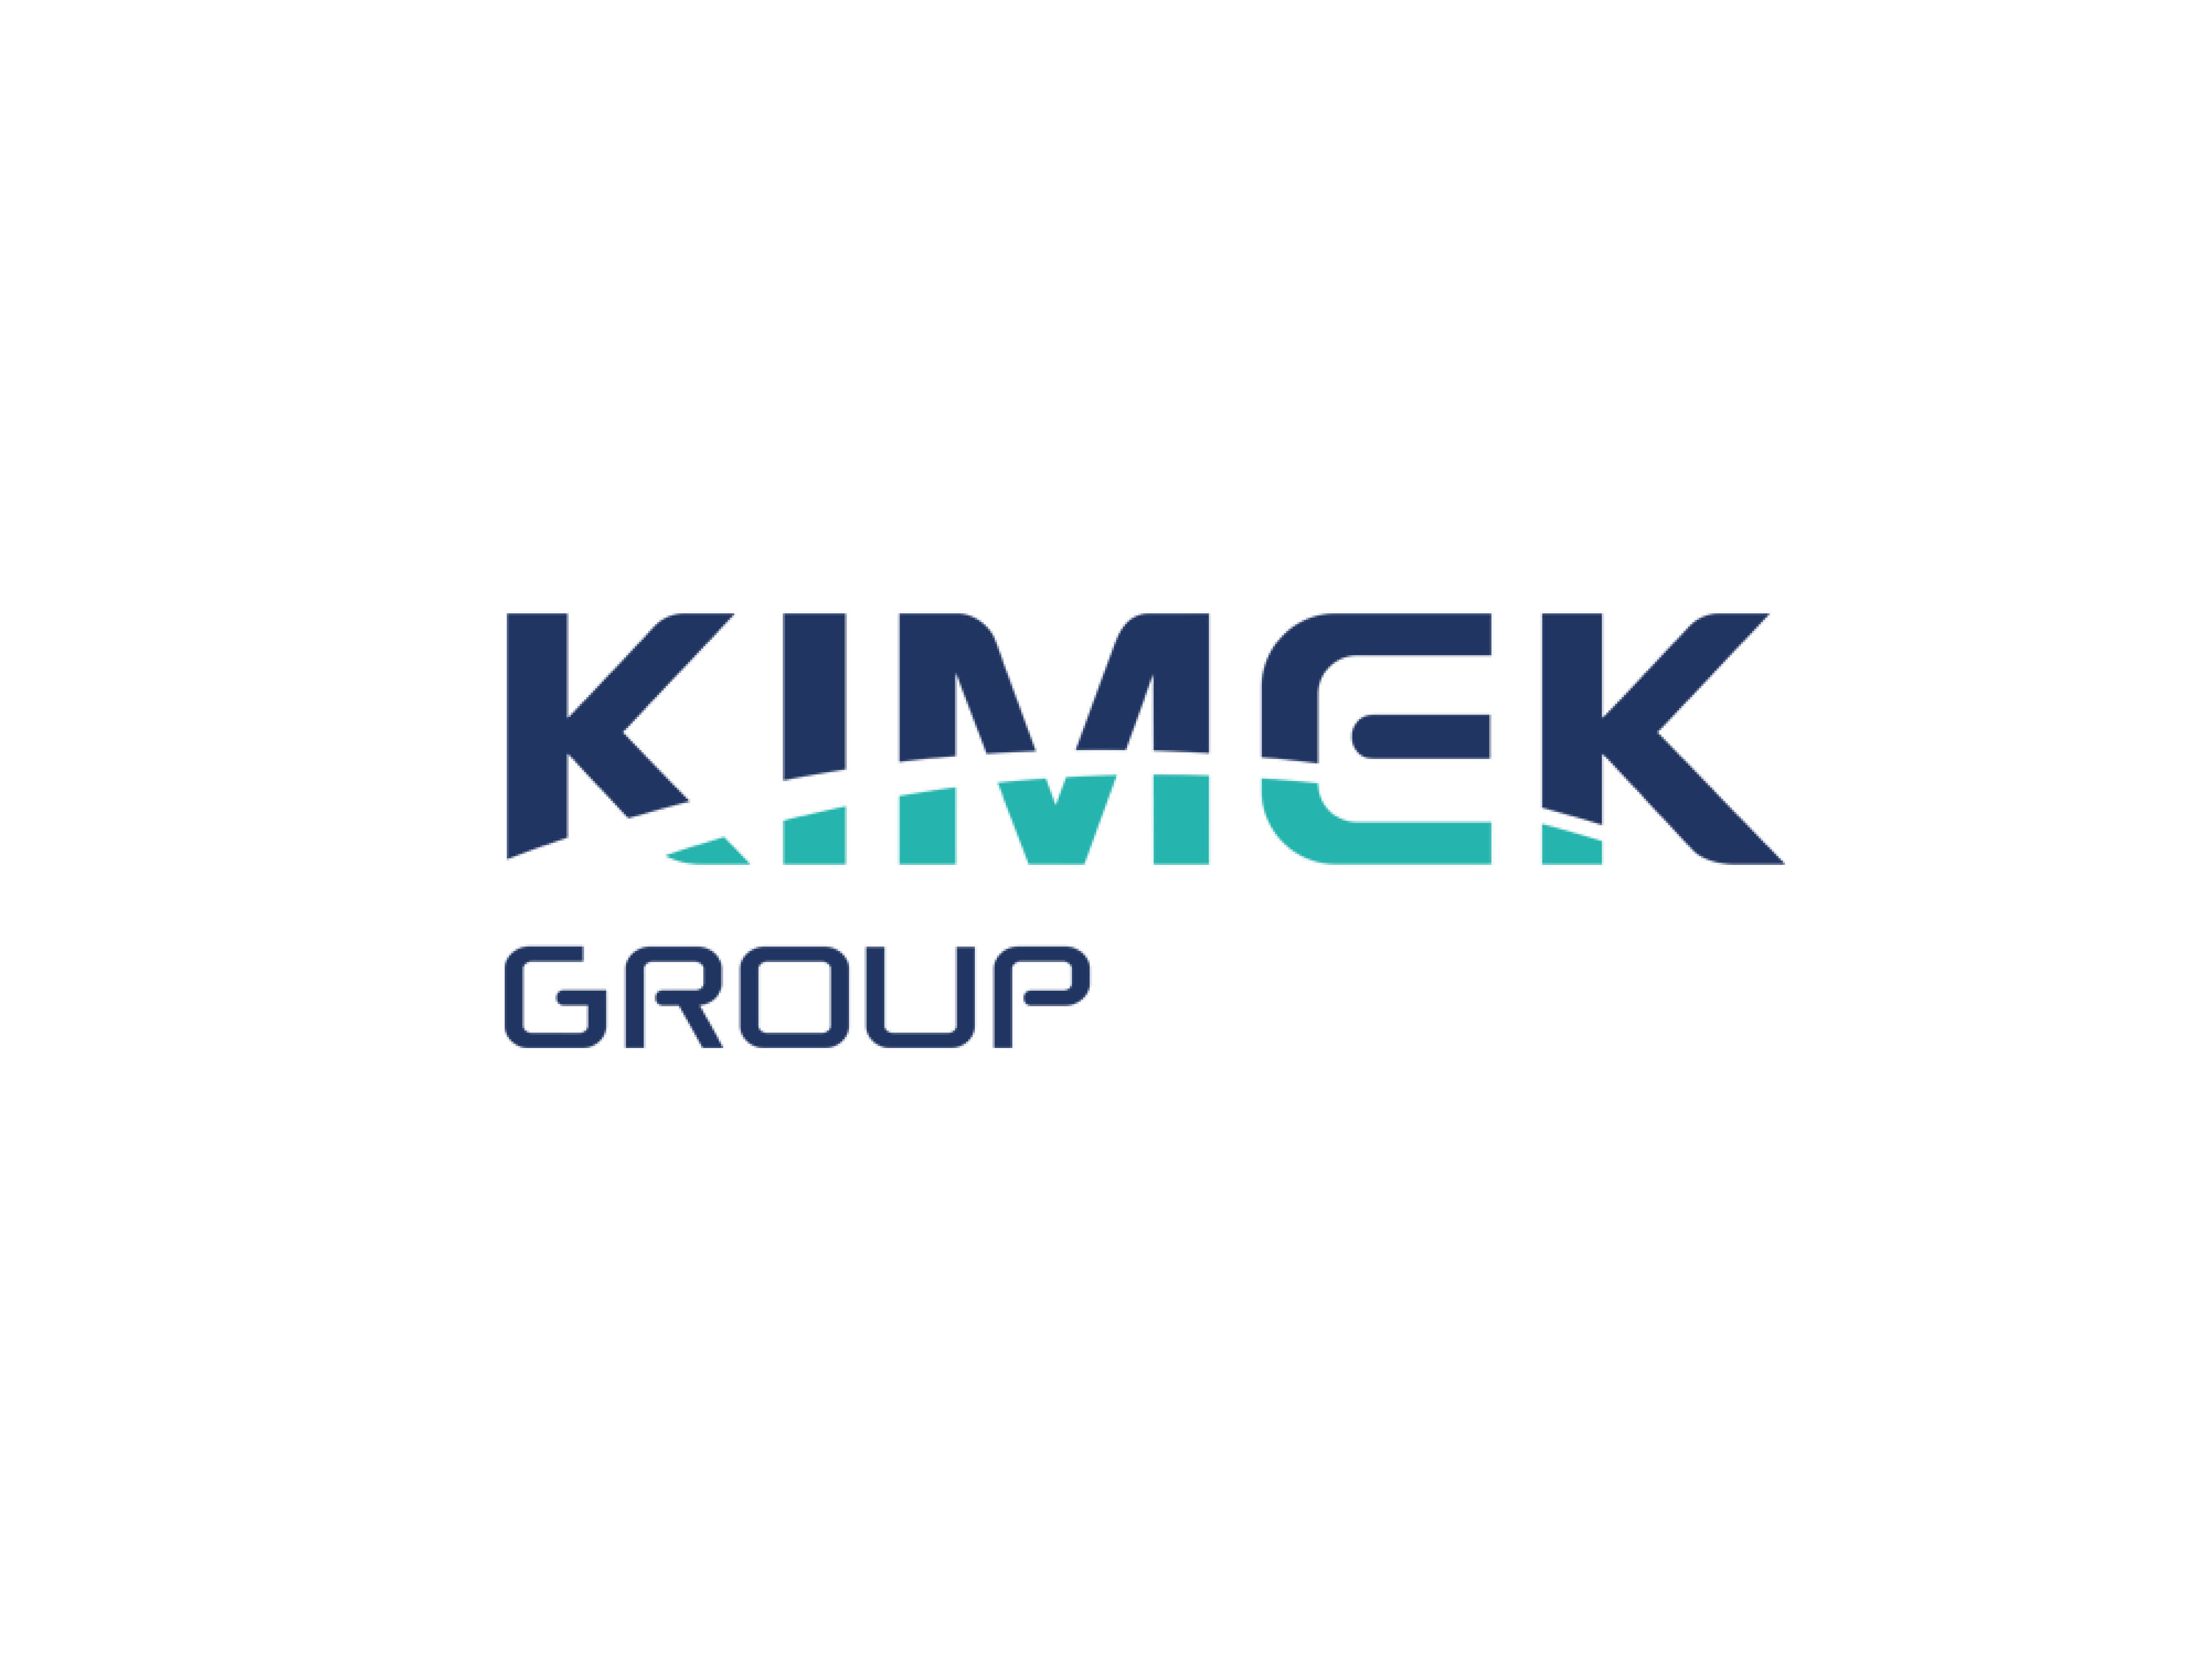 KIMEK logo